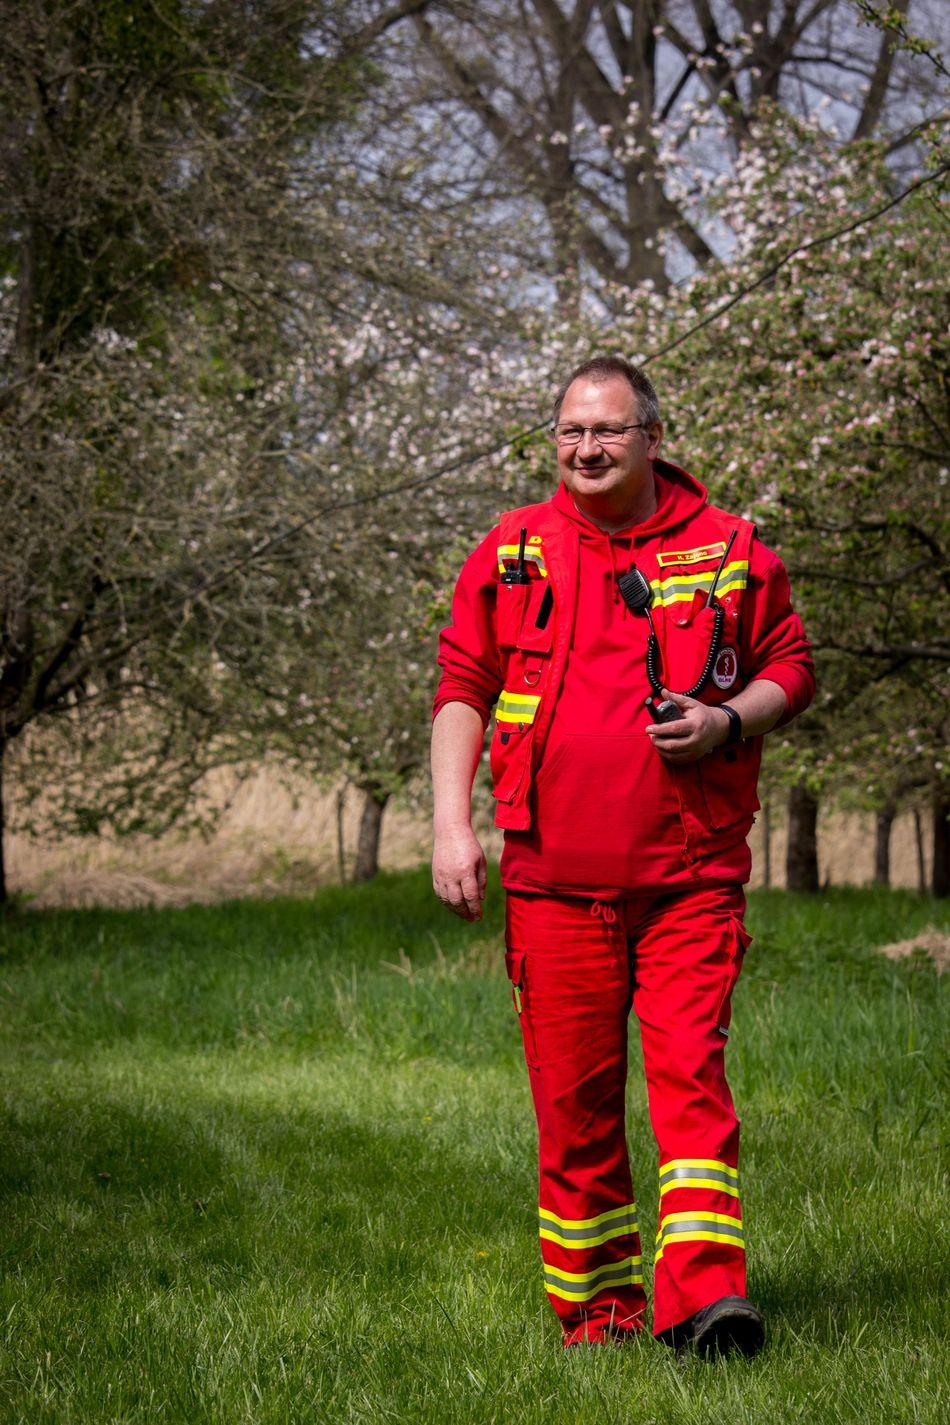 Day Deutsche Lebens-Rettungs-Gesellschaft DLRG DLRG Nieder-Olm Wörrstadt Happiness Lifeguard  Livesaving One Man Only One Person Only Men Outdoors People Red Smiling Sports Uniform